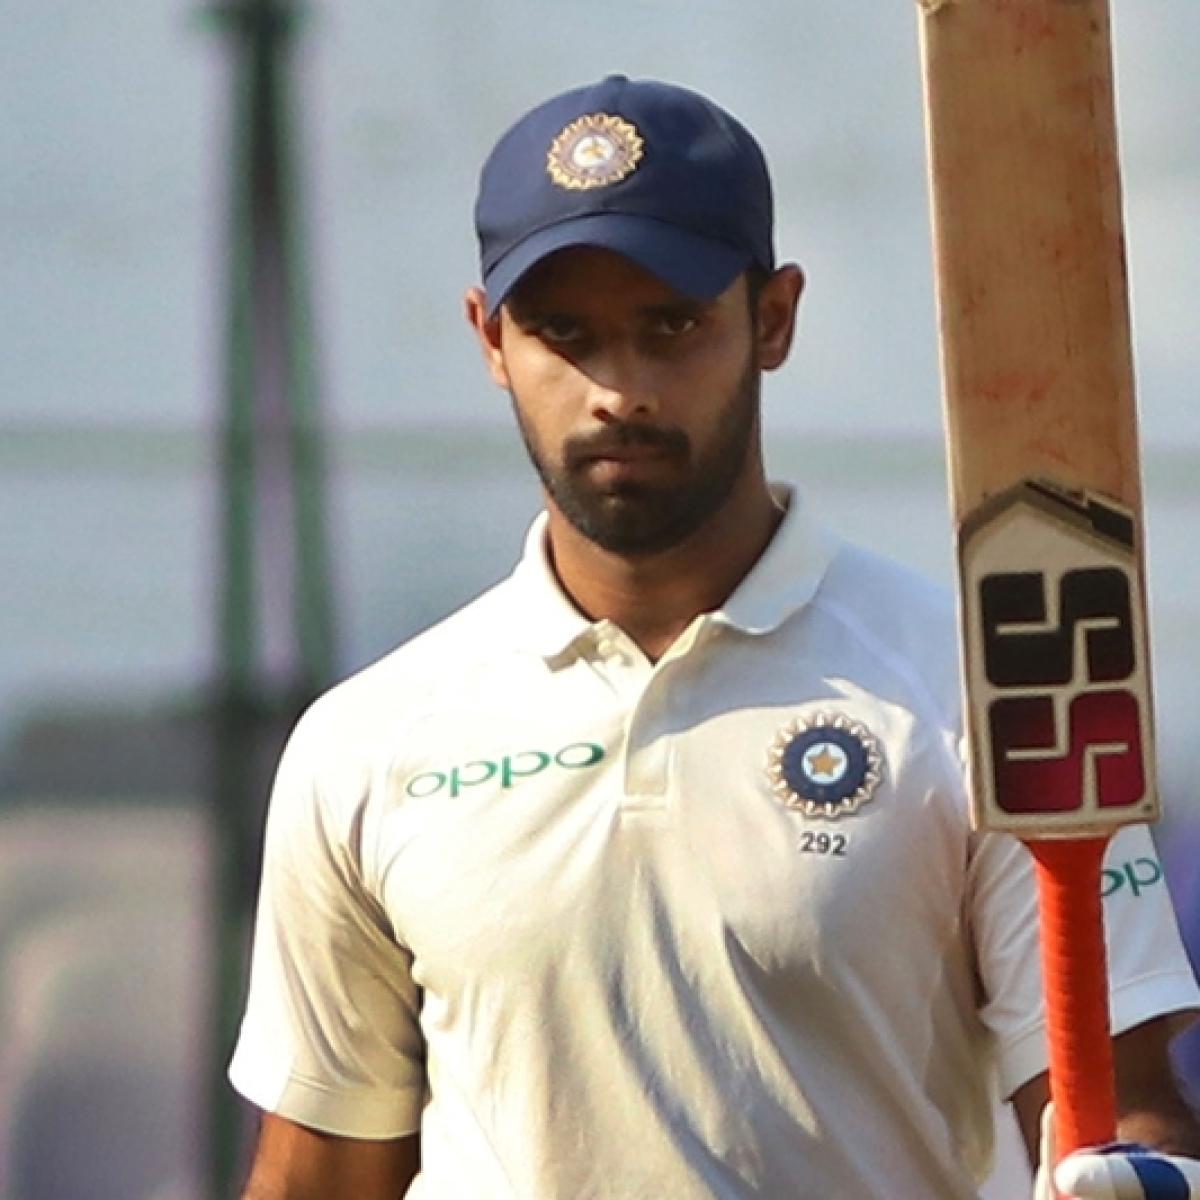 Ind vs Aus Test Series: We are ready for pink ball Test, says Hanuma Vihari